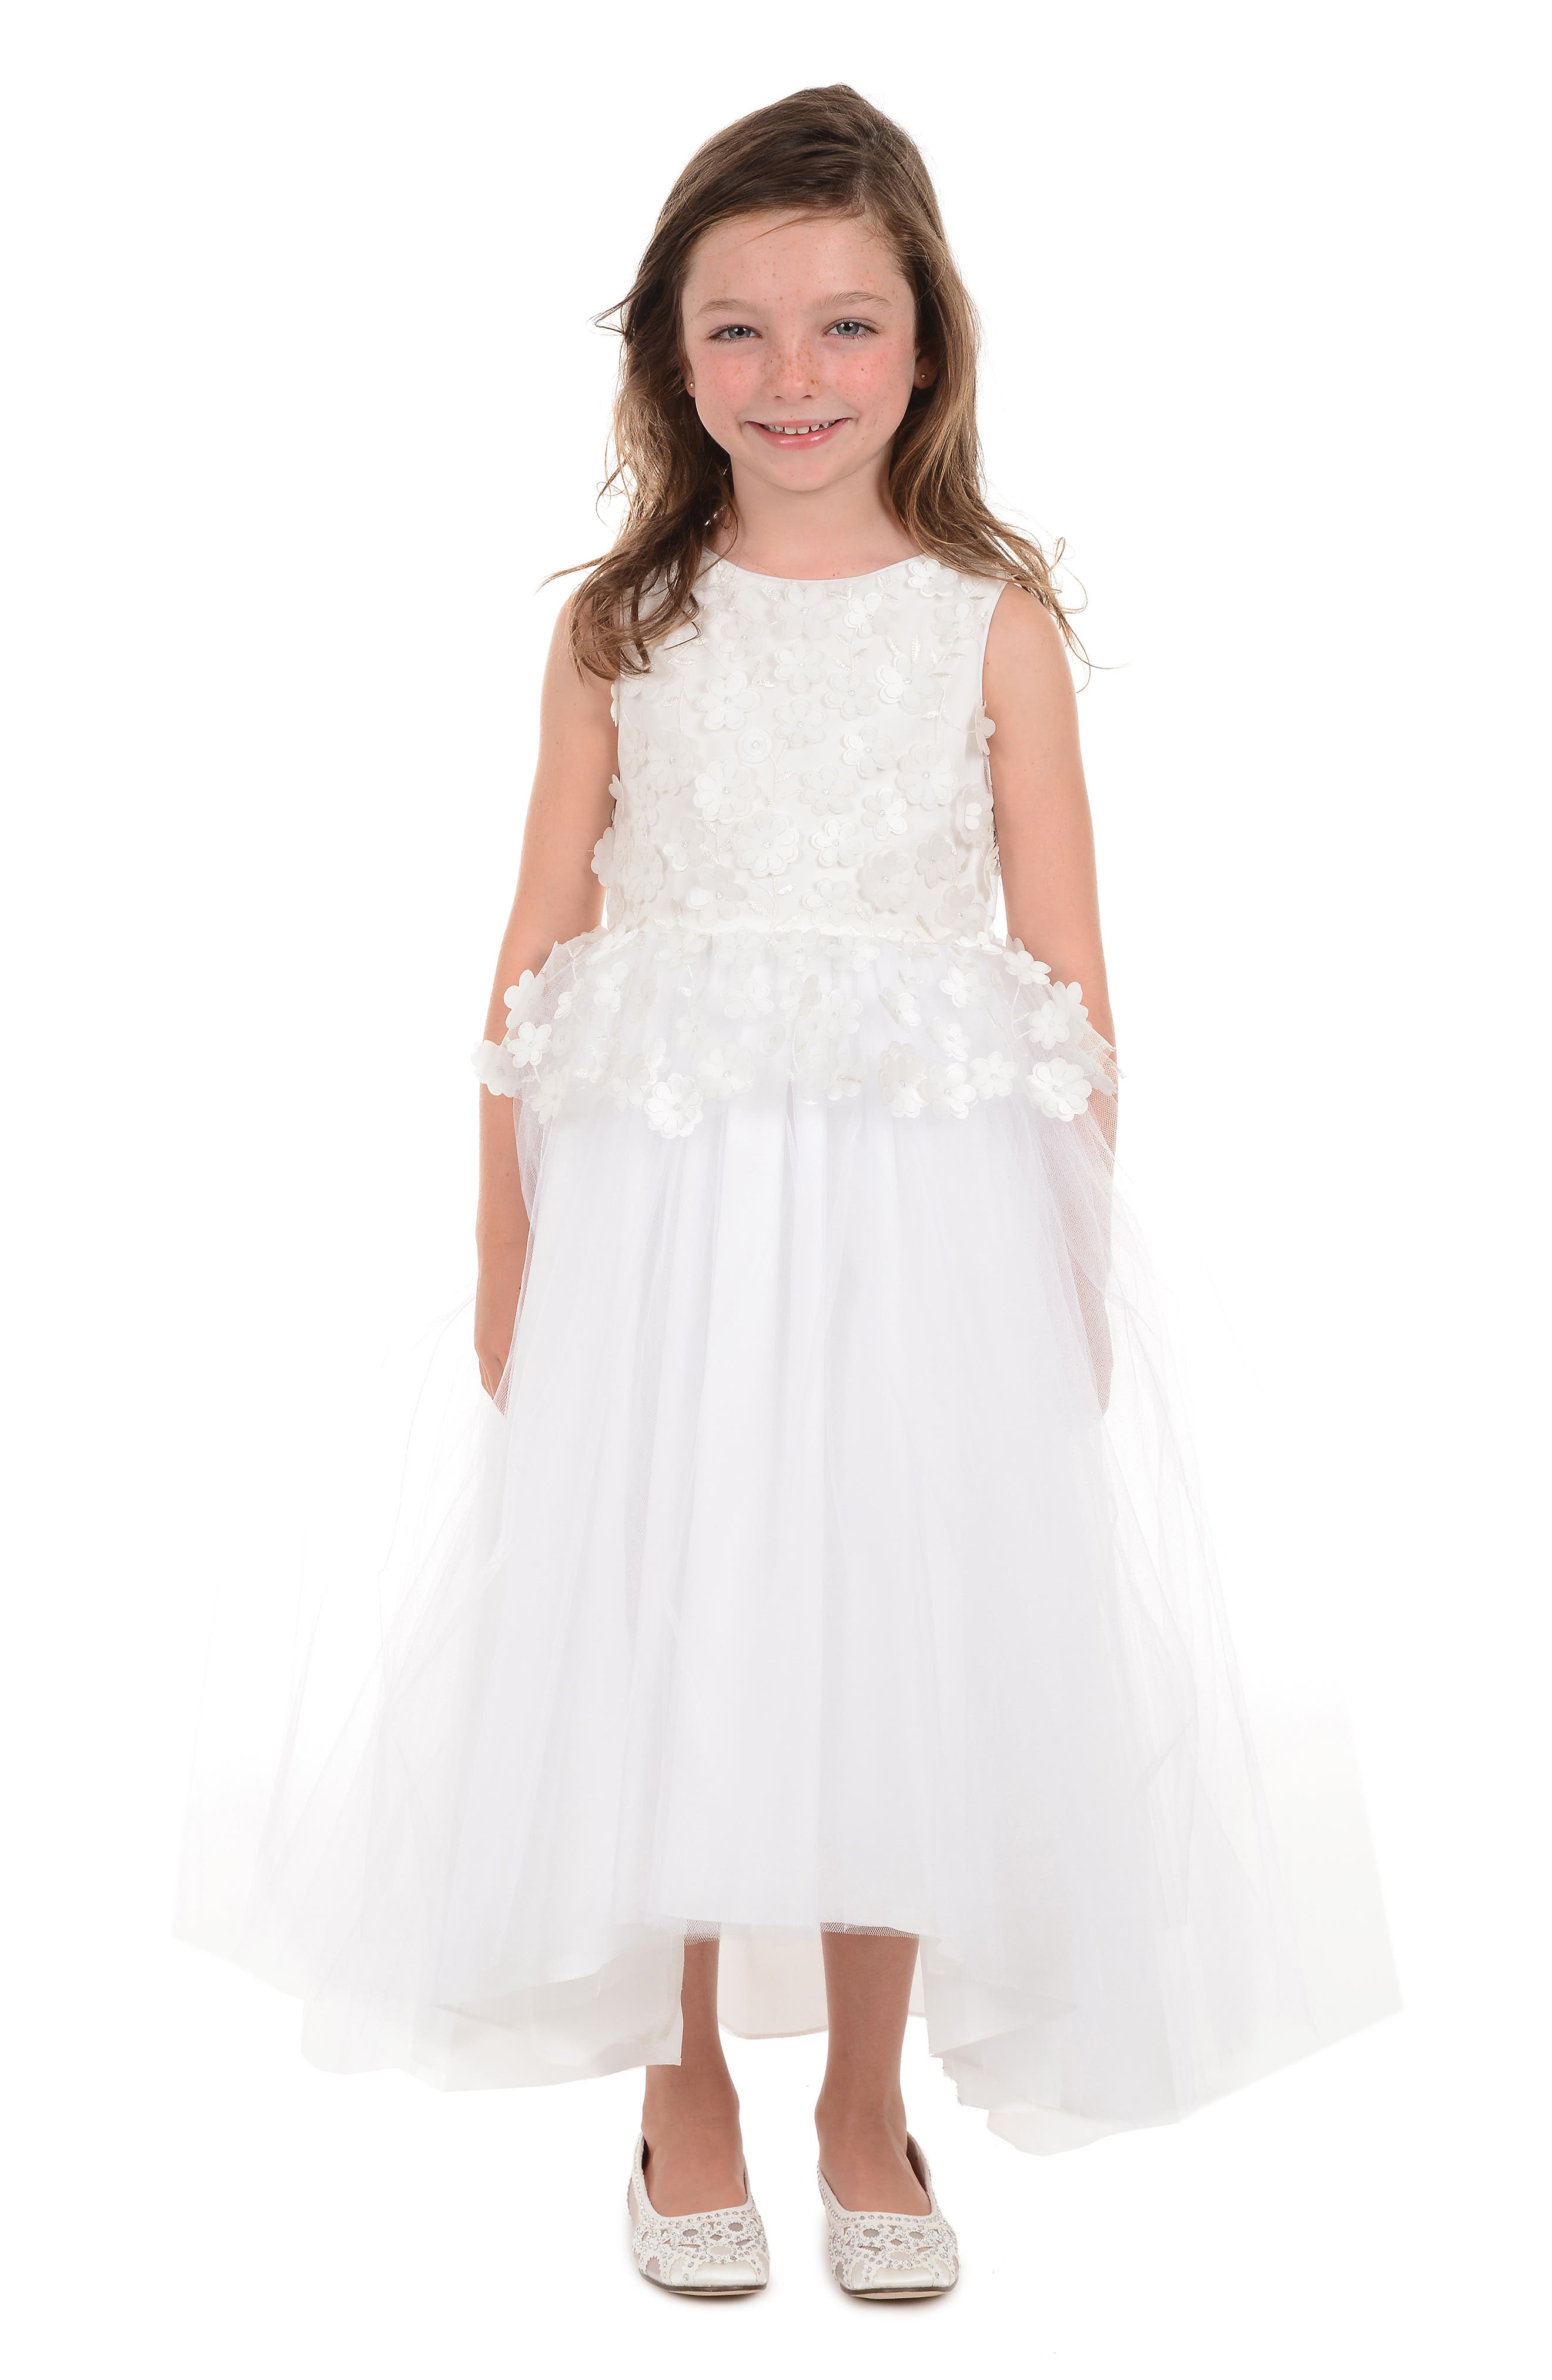 BADGLEY MISCHKA COLLECTION, Badgley Mischka 3D Flower Peplum Dress, Alternate thumbnail 3, color, WHITE